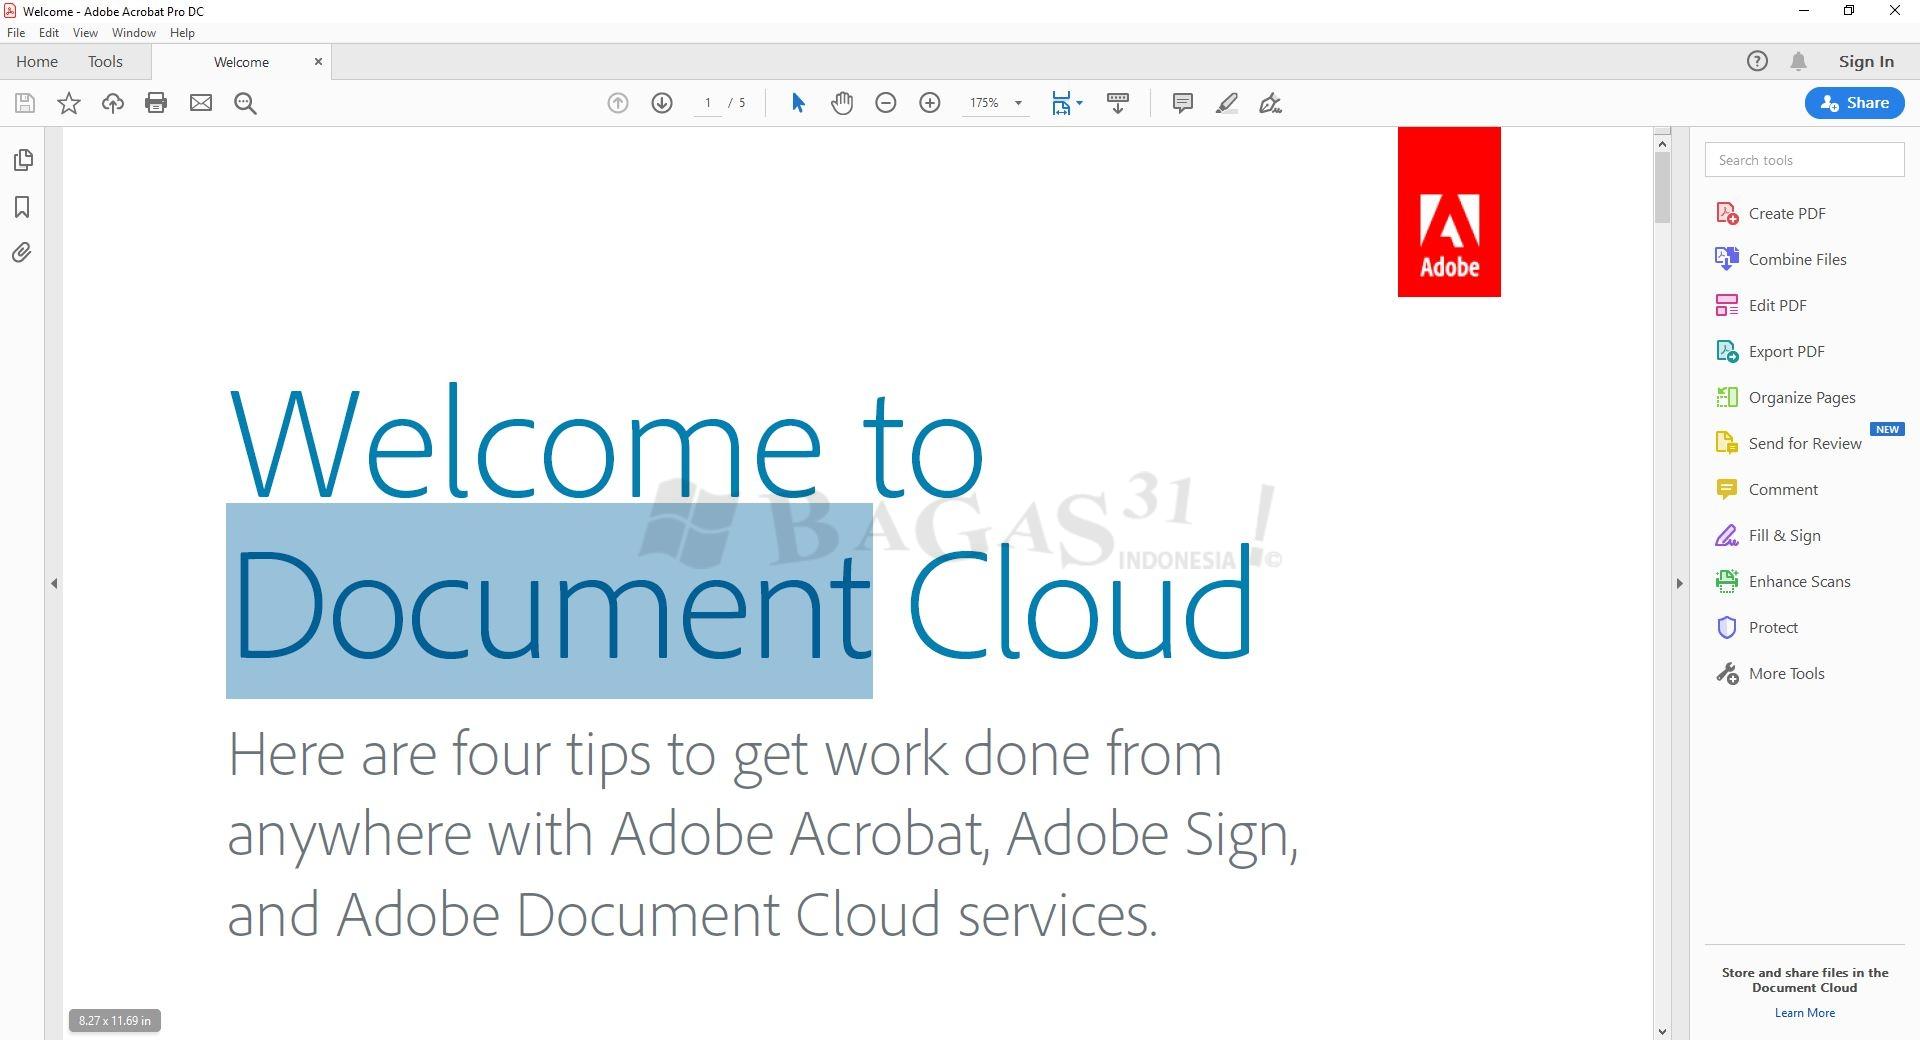 Adobe Acrobat Pro DC 2019.021.20047 Full Version 3